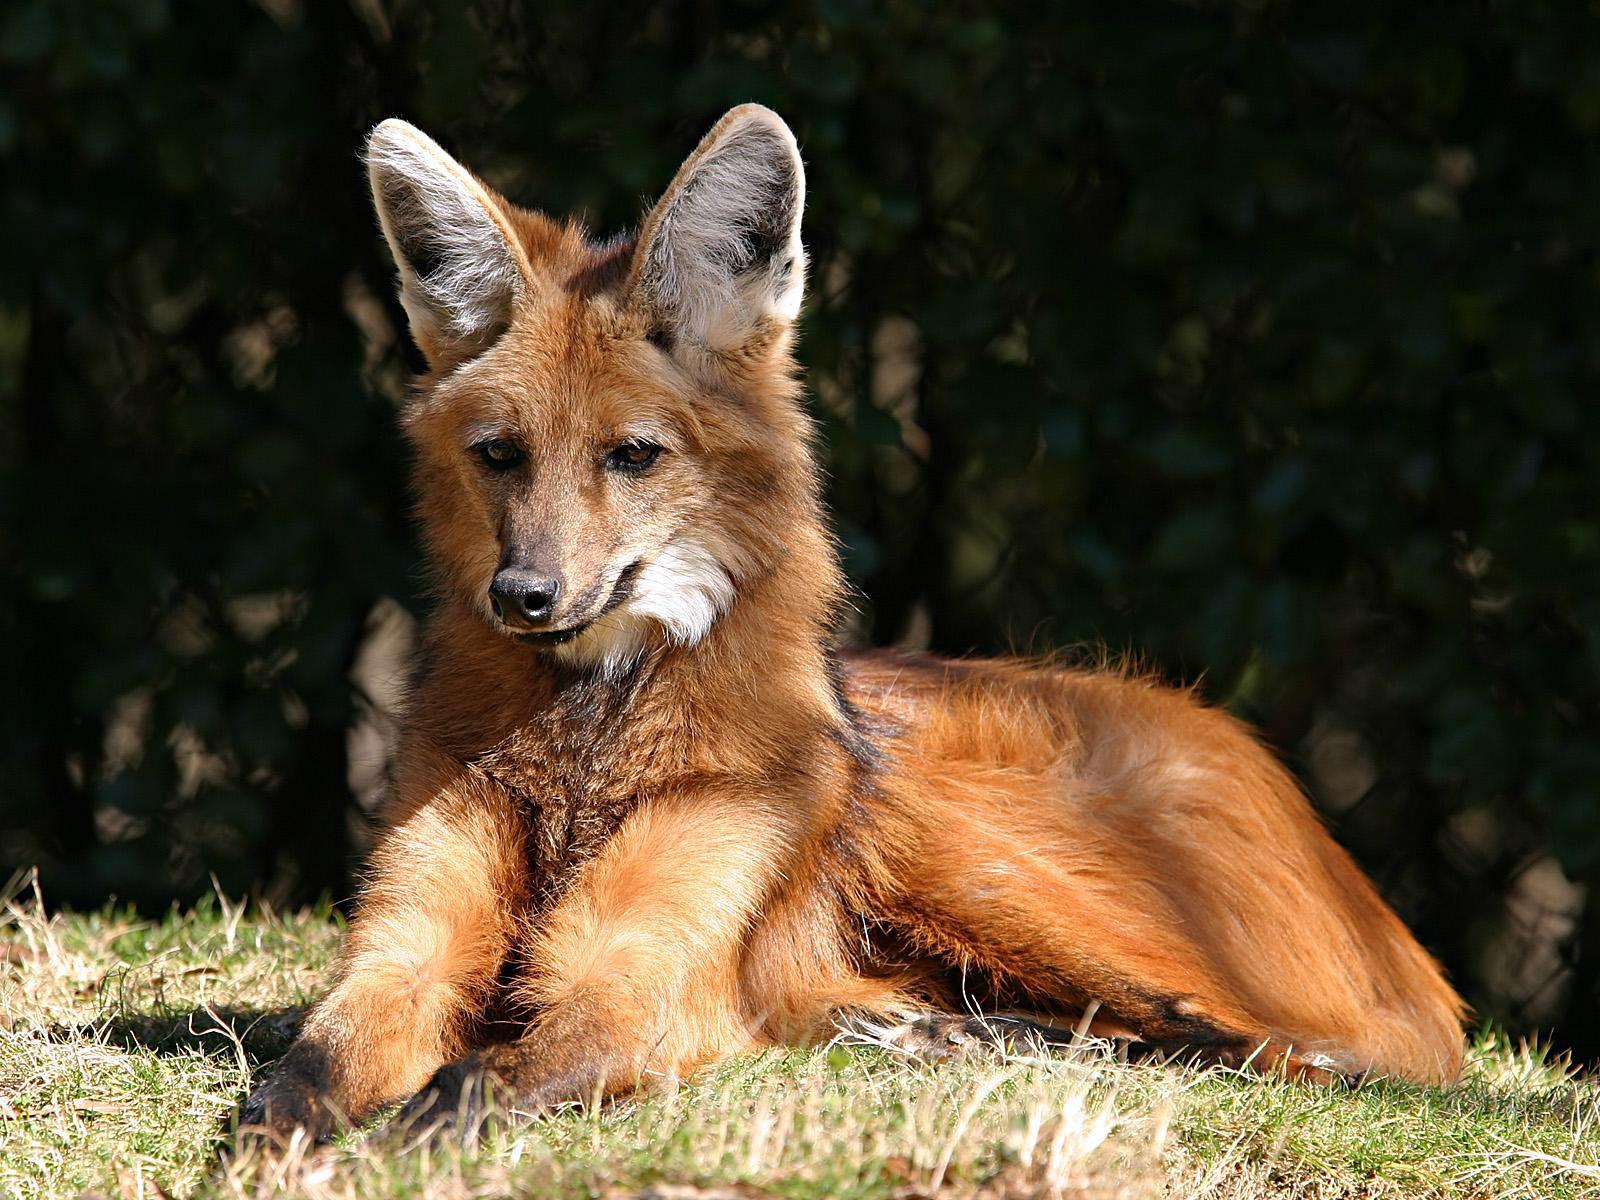 http://2.bp.blogspot.com/_sz2fJjO1XW8/TIvERT234vI/AAAAAAAAE3o/kvtQexQyQKE/s1600/Red_fox_(Canada,_Alaska,_United_States,_Europe,_North_Africa,_Asia,_Japan,_Ireland,_UK).jpg